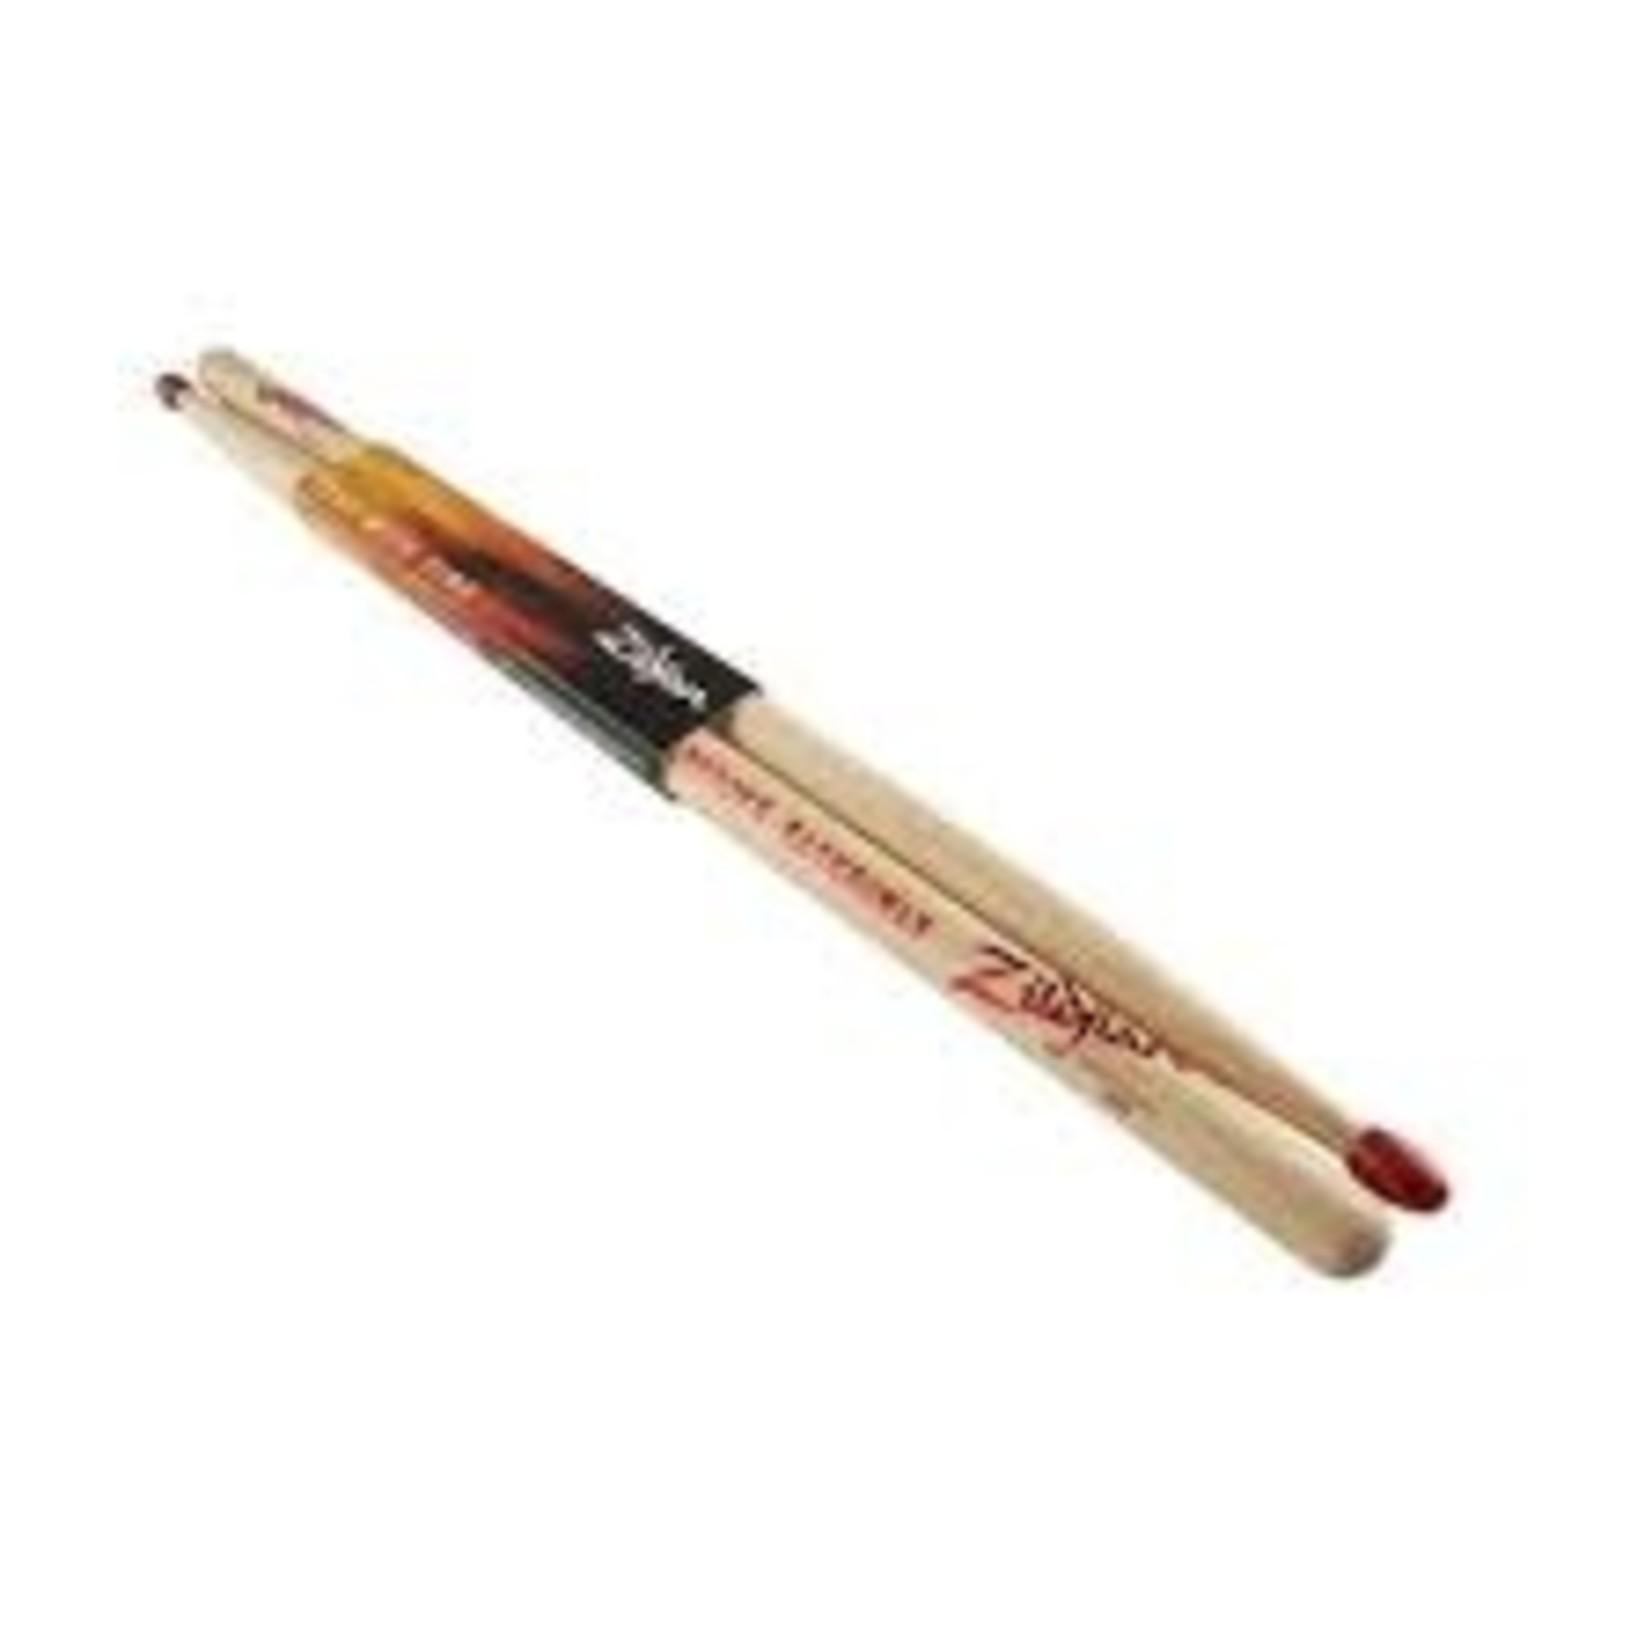 Zildjian Zildjian Brooks Wackerman Artist Series Drumsticks